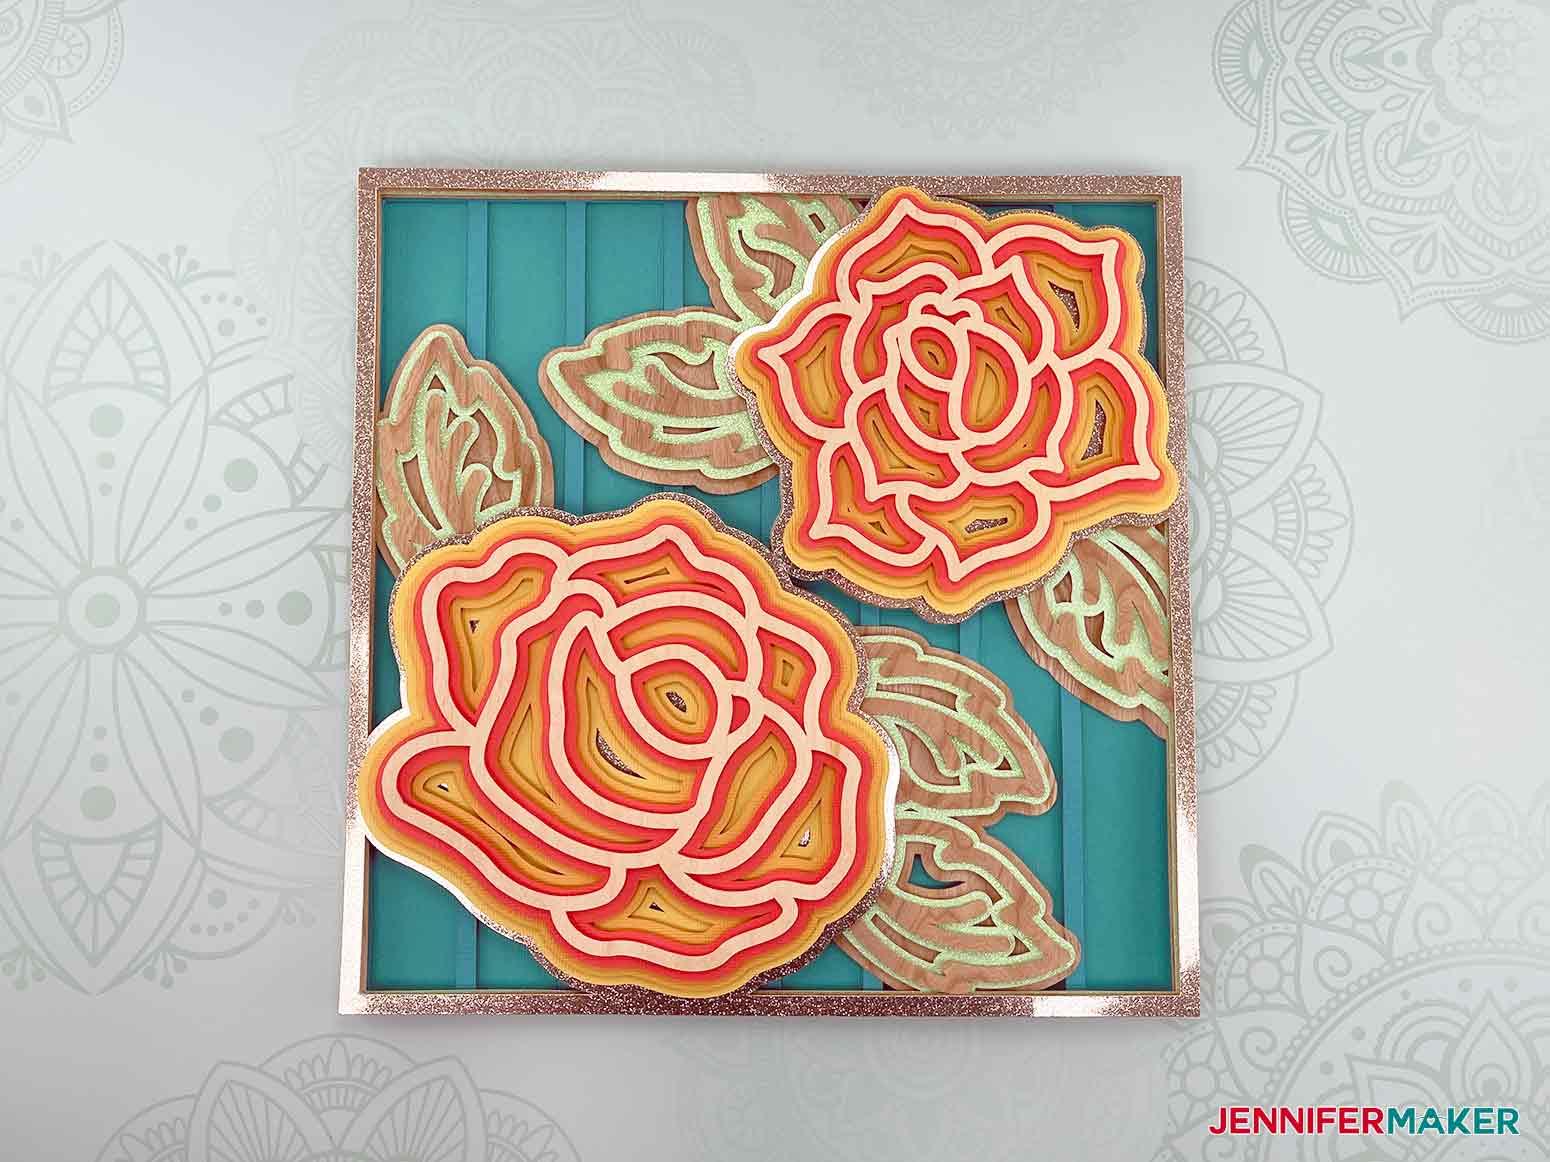 This is what my layered mandala rose 3d looks like using cardstock and wood veneer